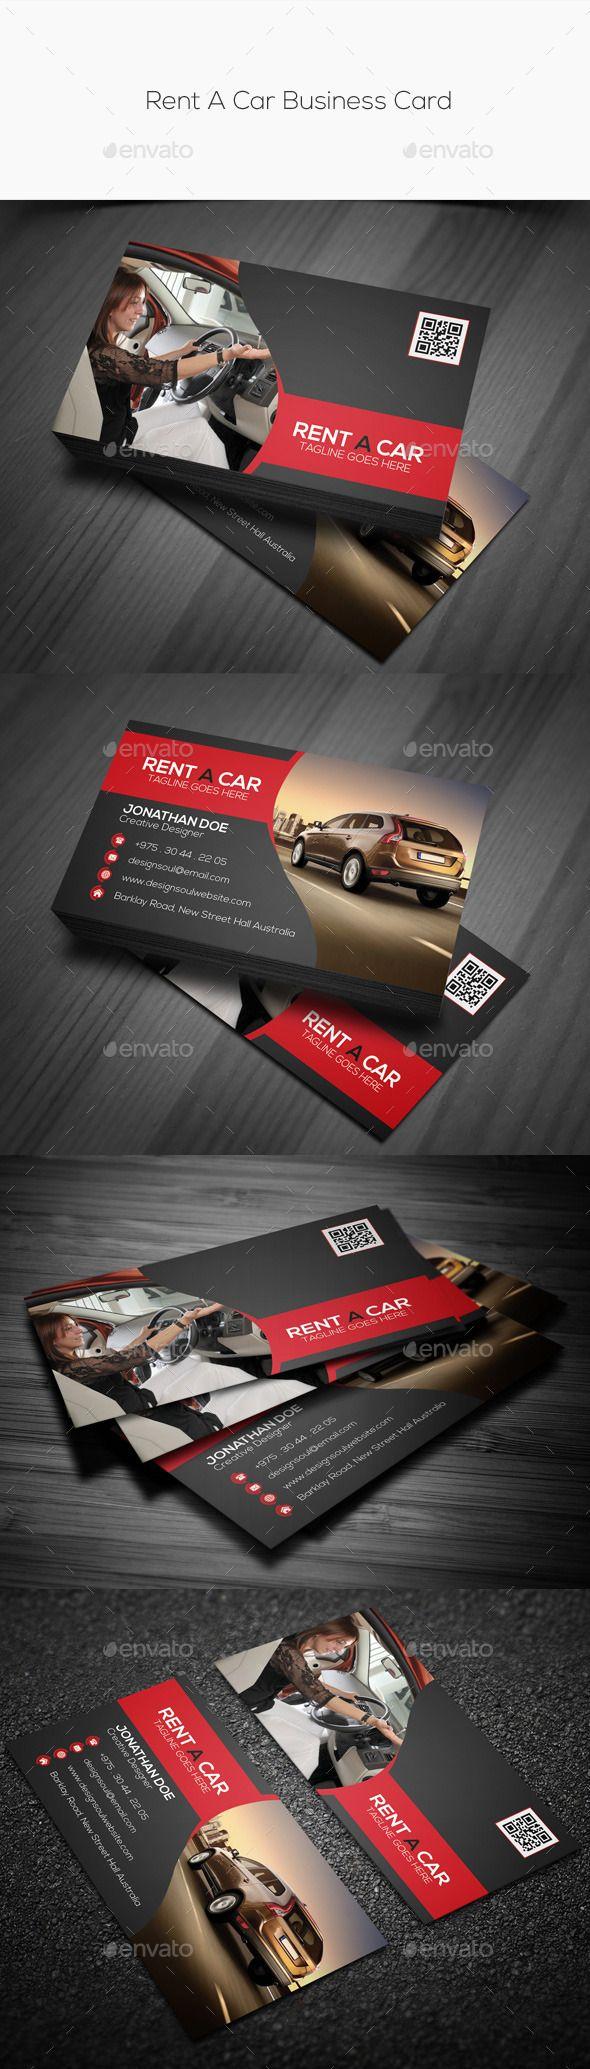 Car sticker design download - Rent A Car Business Card